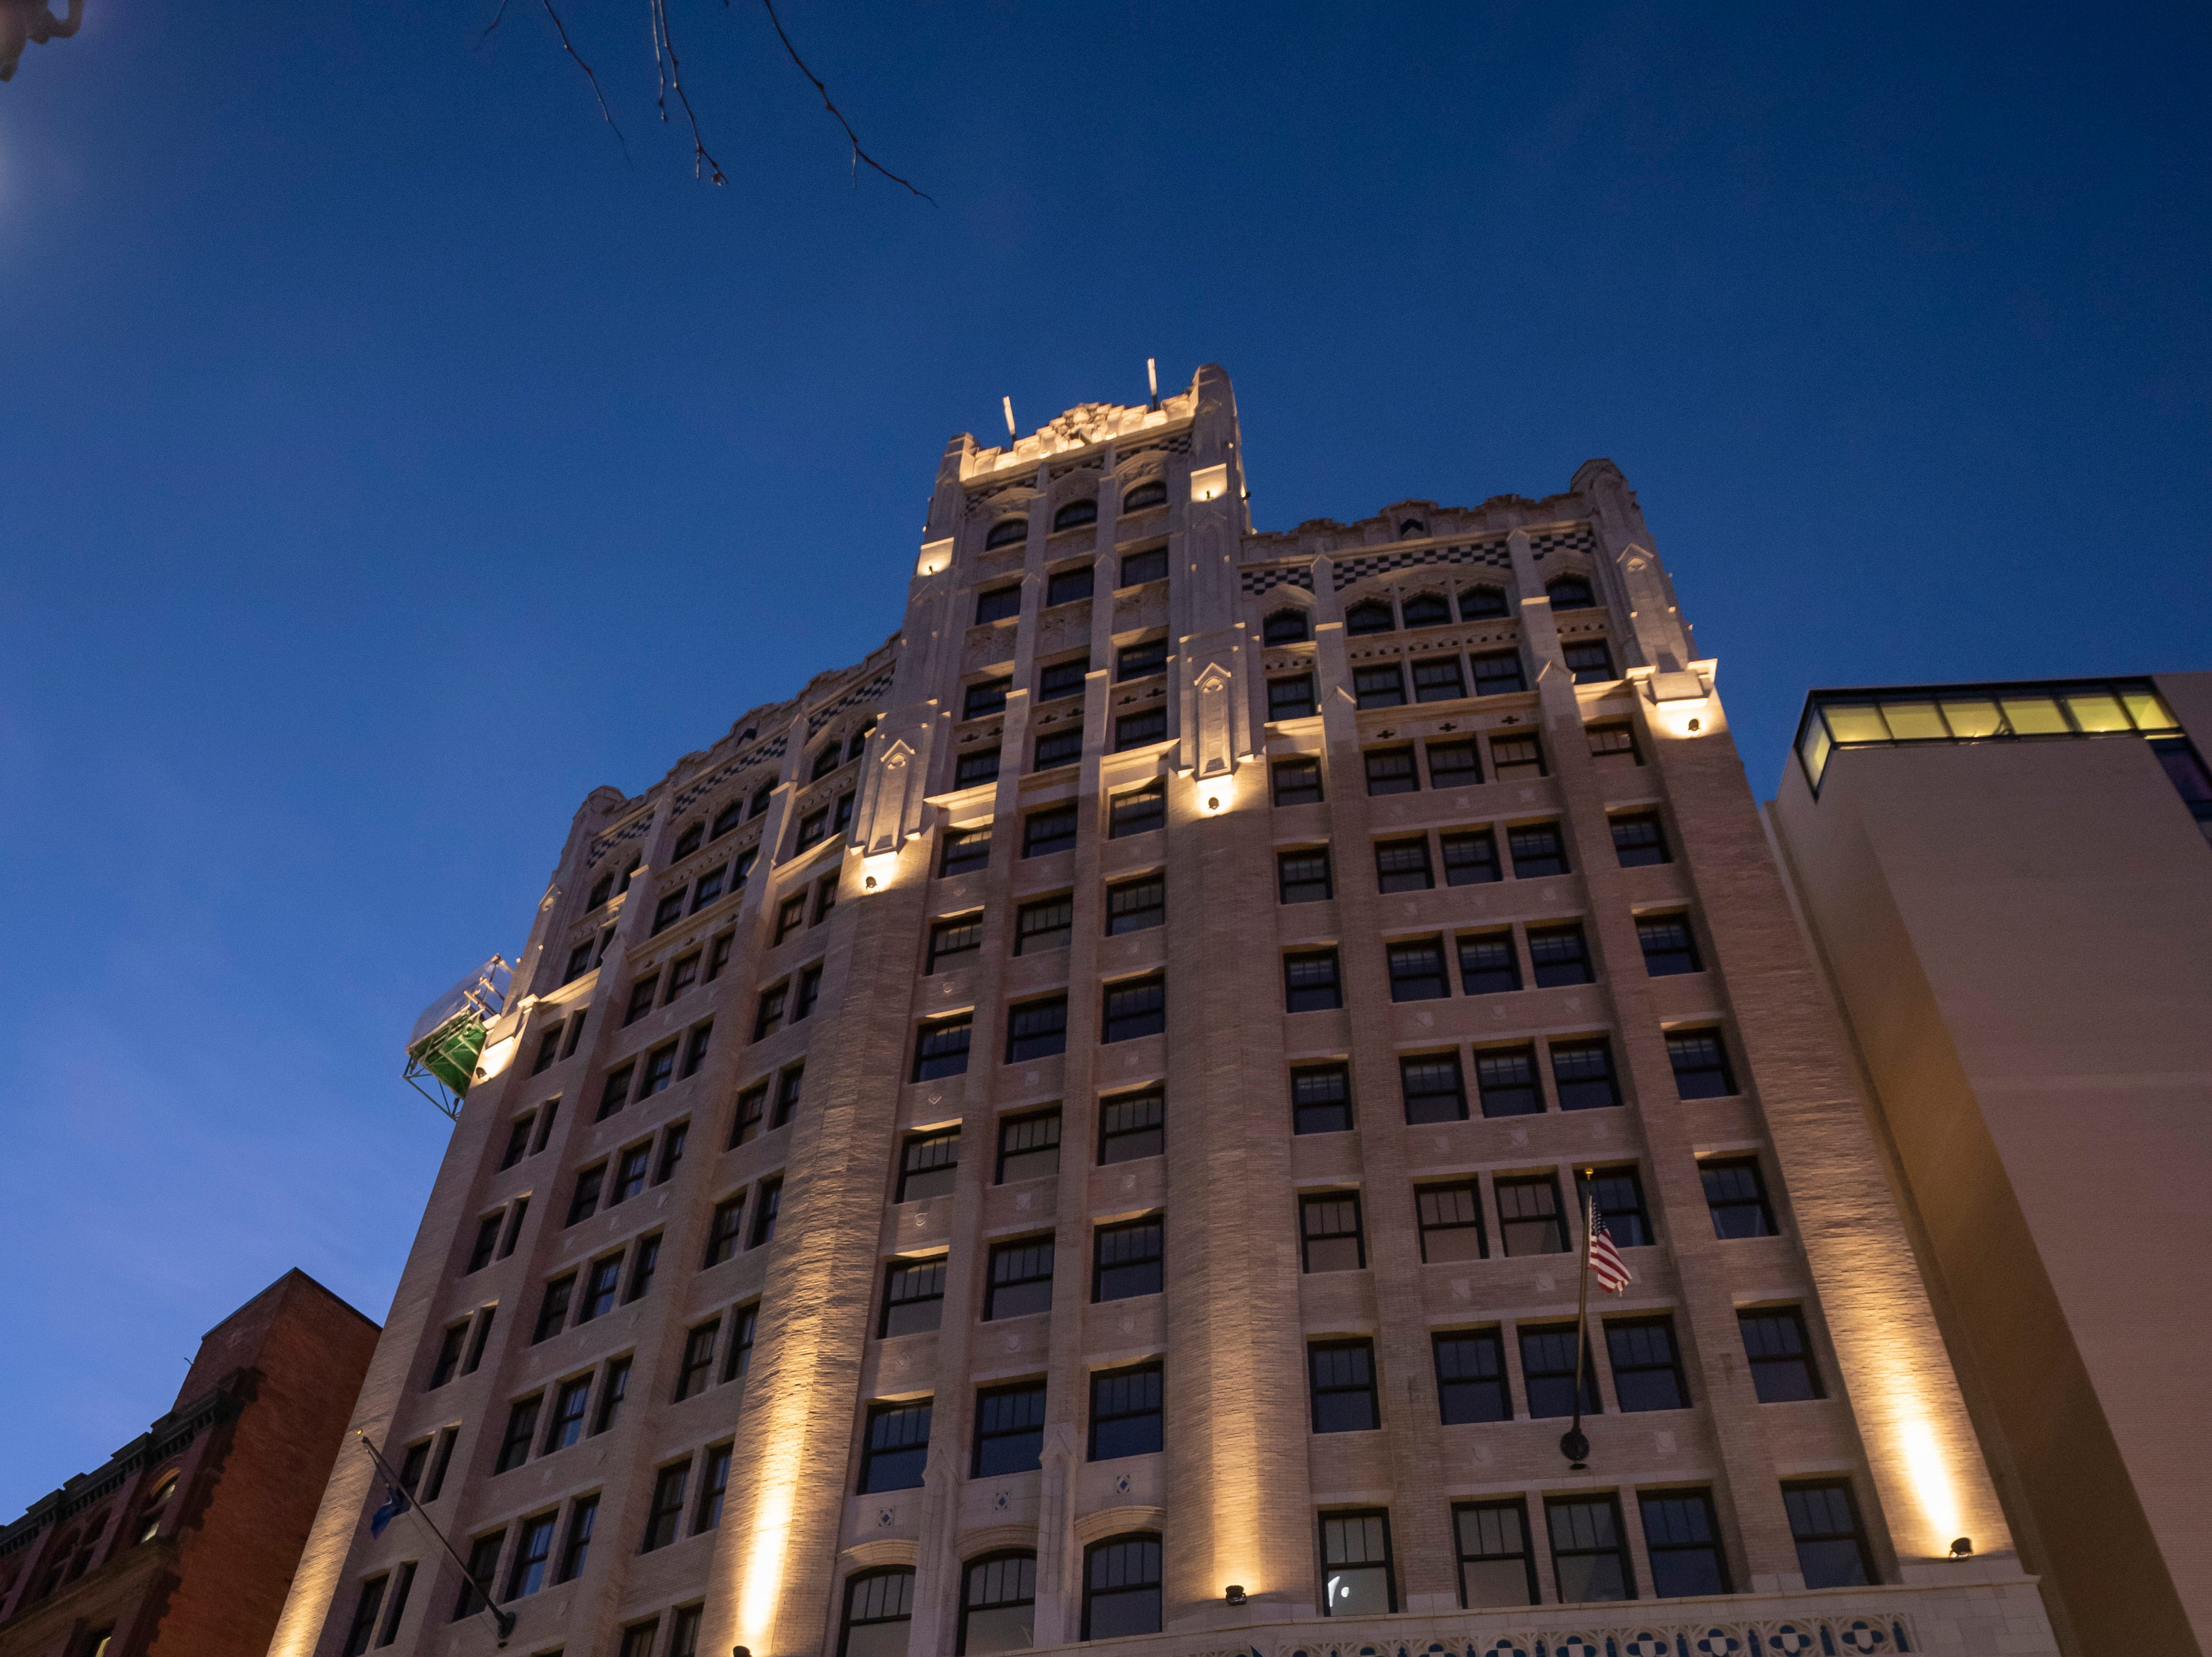 The Metropolitan building in Detroit, December 17, 2018.